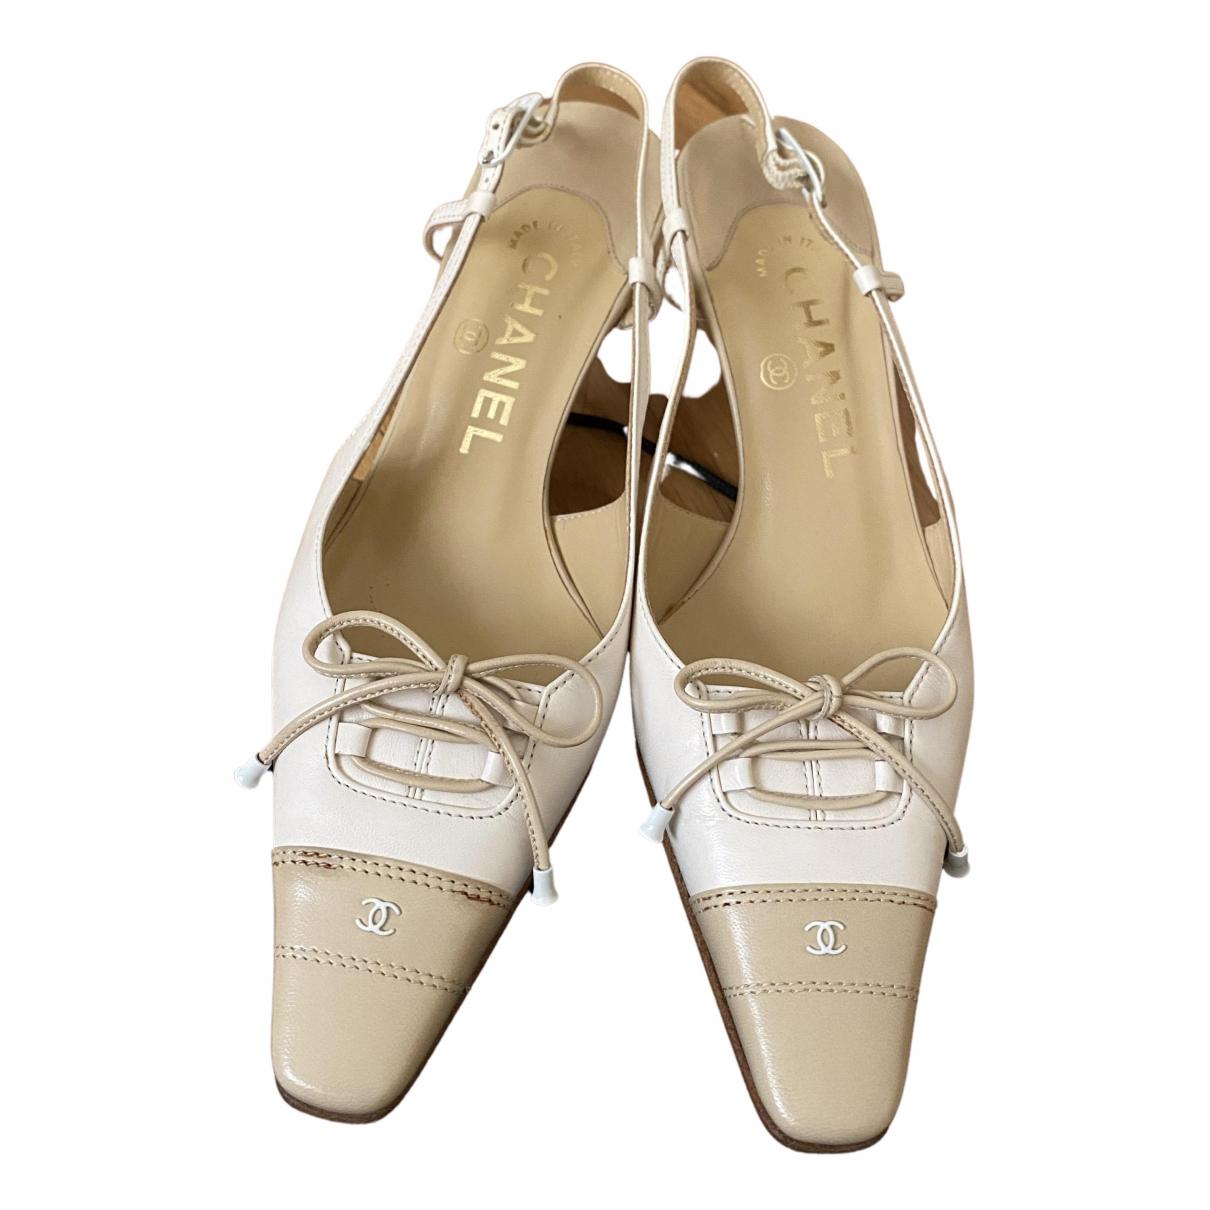 Chanel N Multicolour Leather Heels for Women 35.5 EU